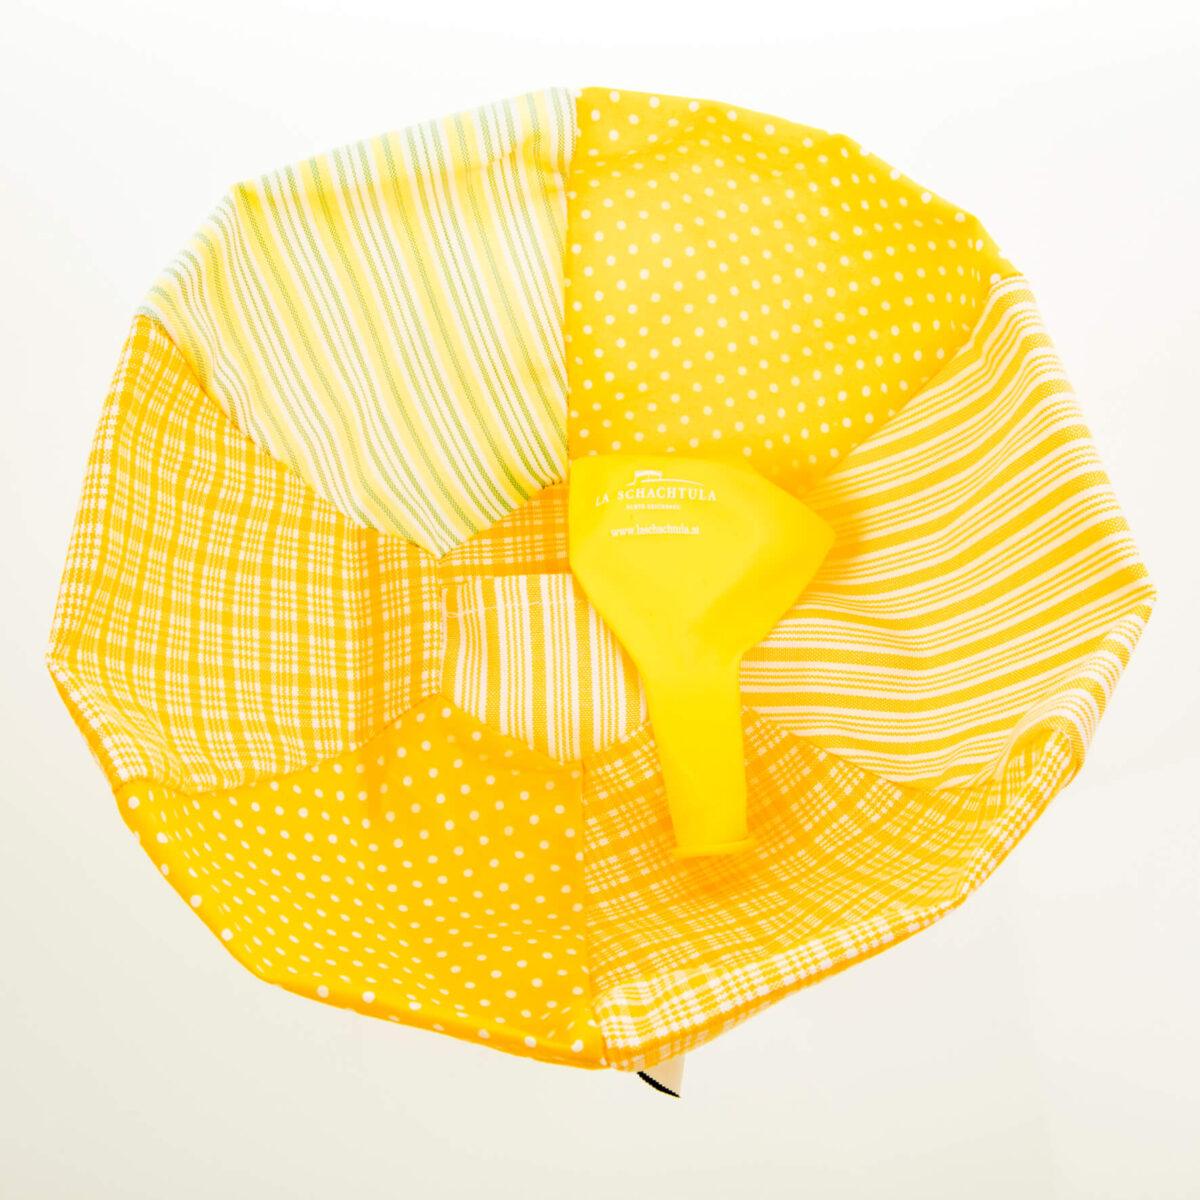 Funktionsprinzip Luftballonhülle